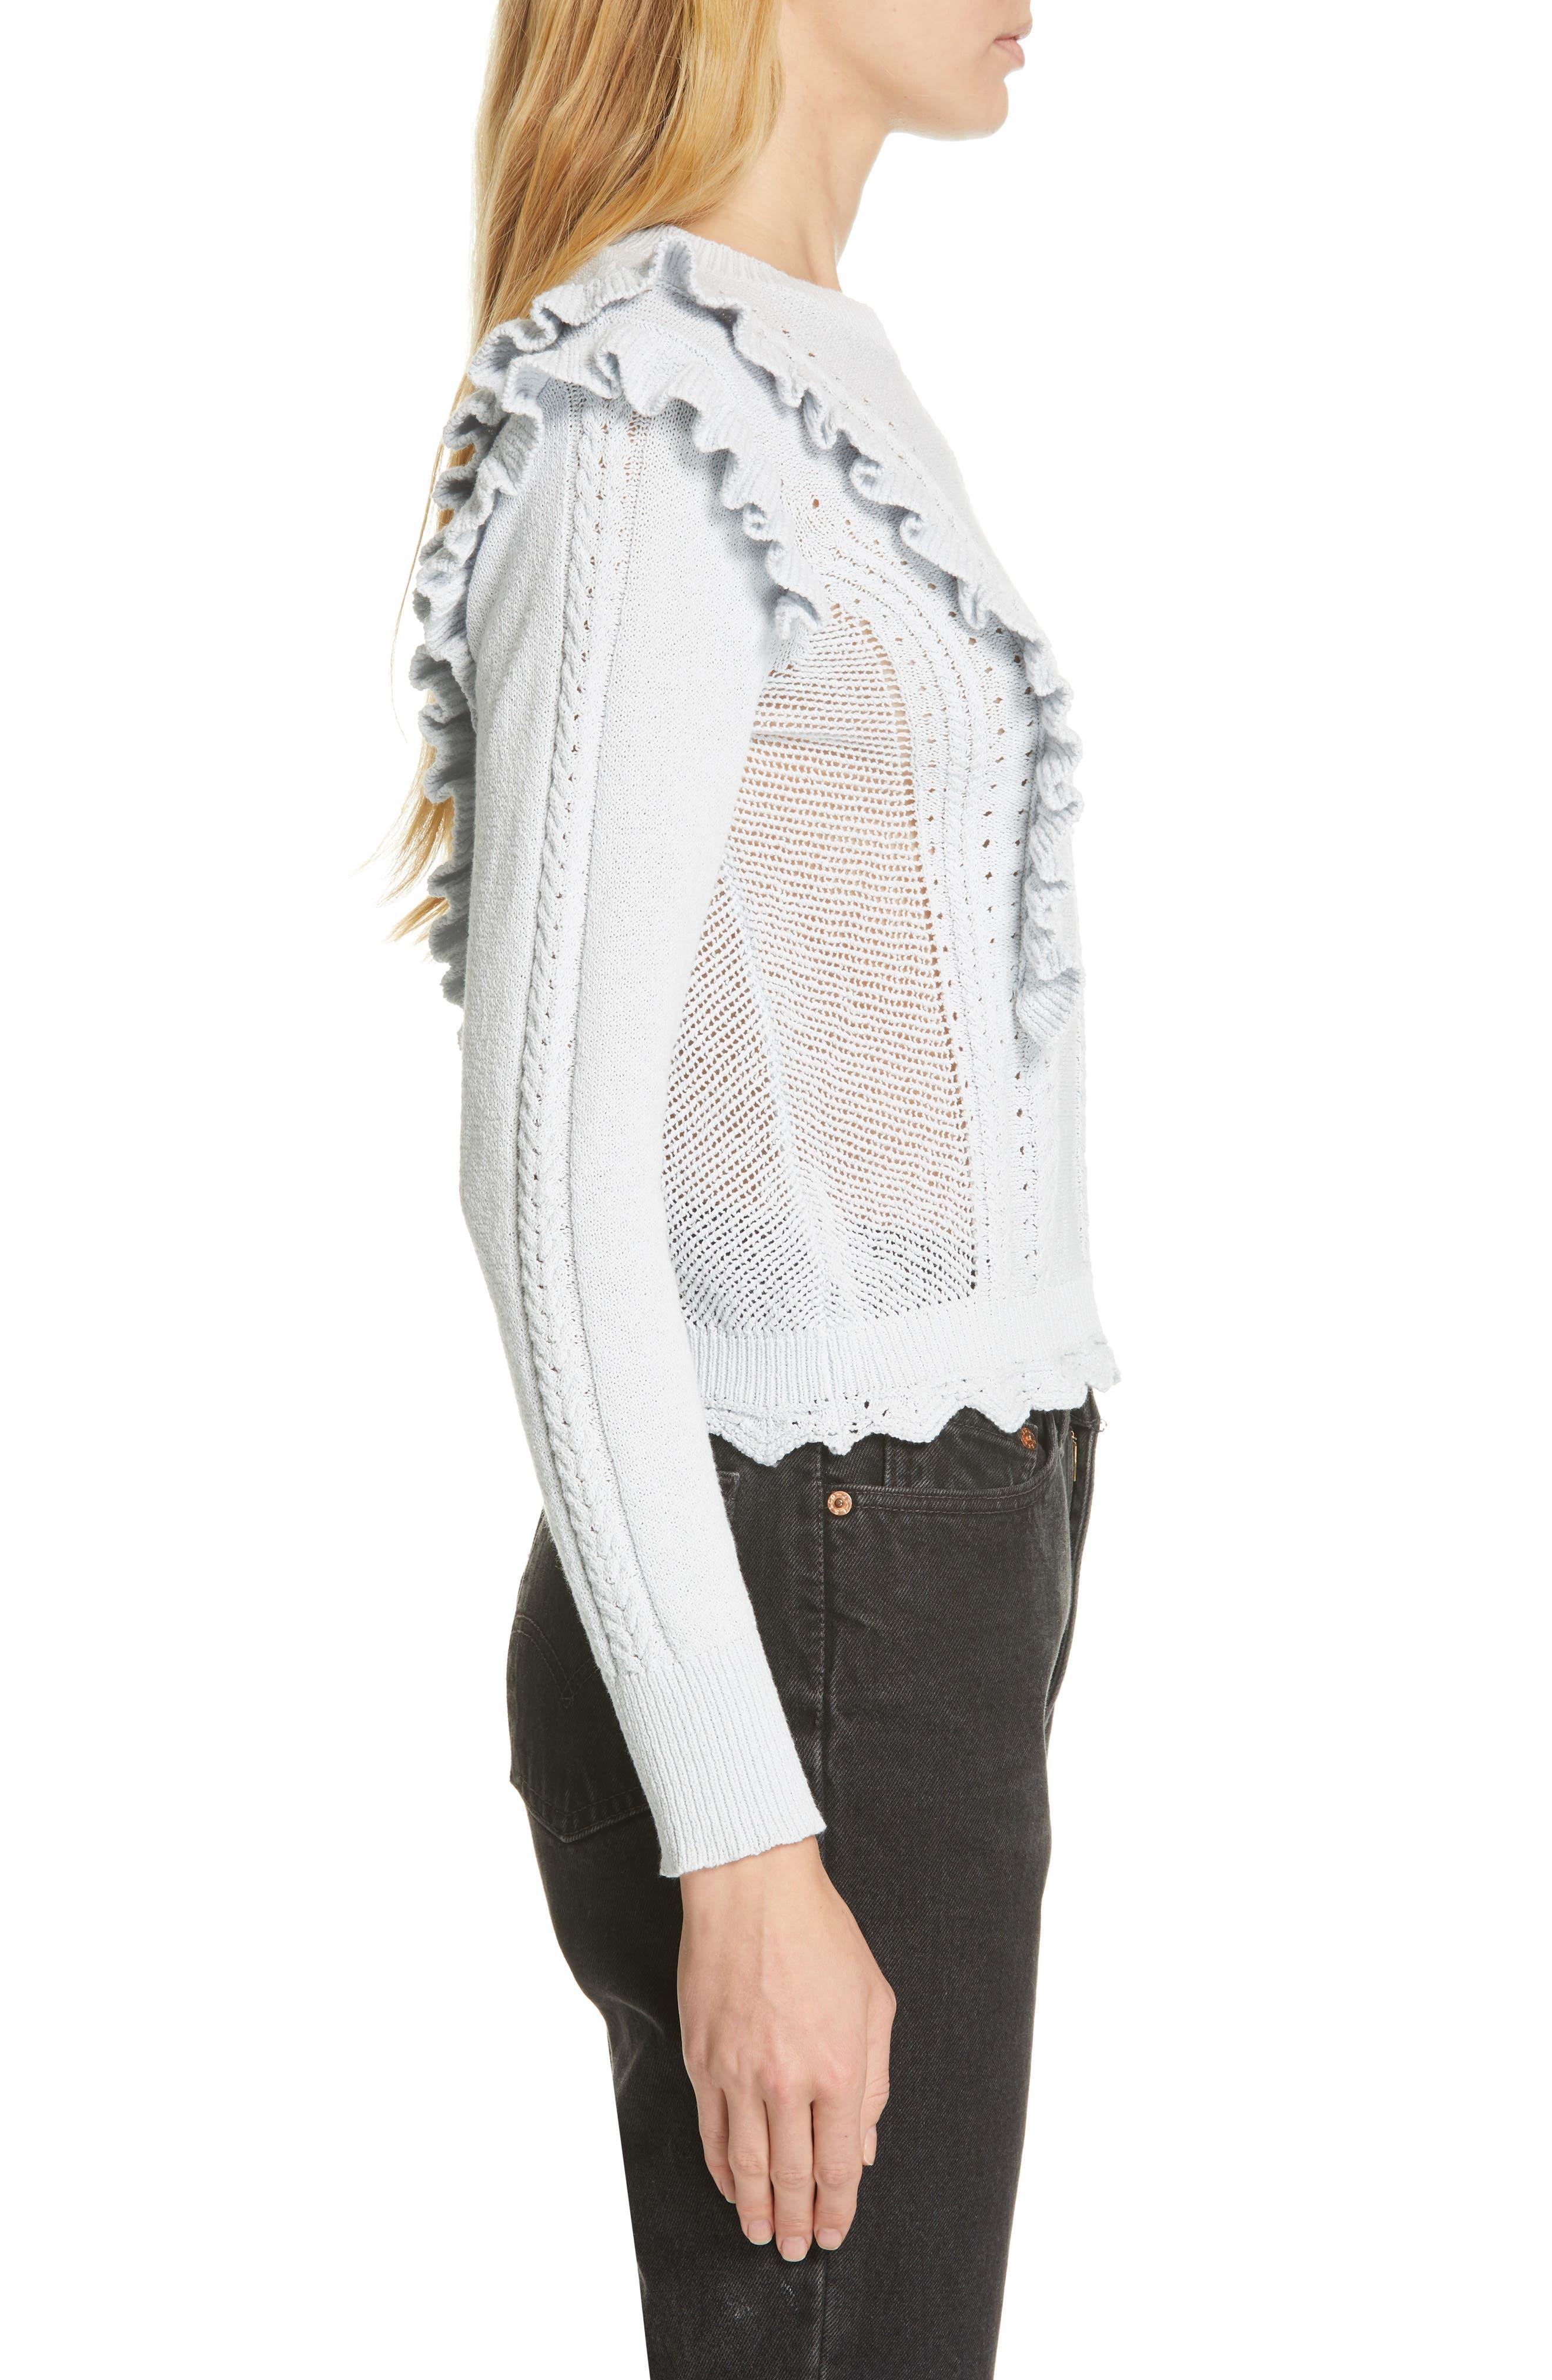 REBECCA TAYLOR, Ruffled Sweater, Alternate thumbnail 3, color, LIGHT MINT